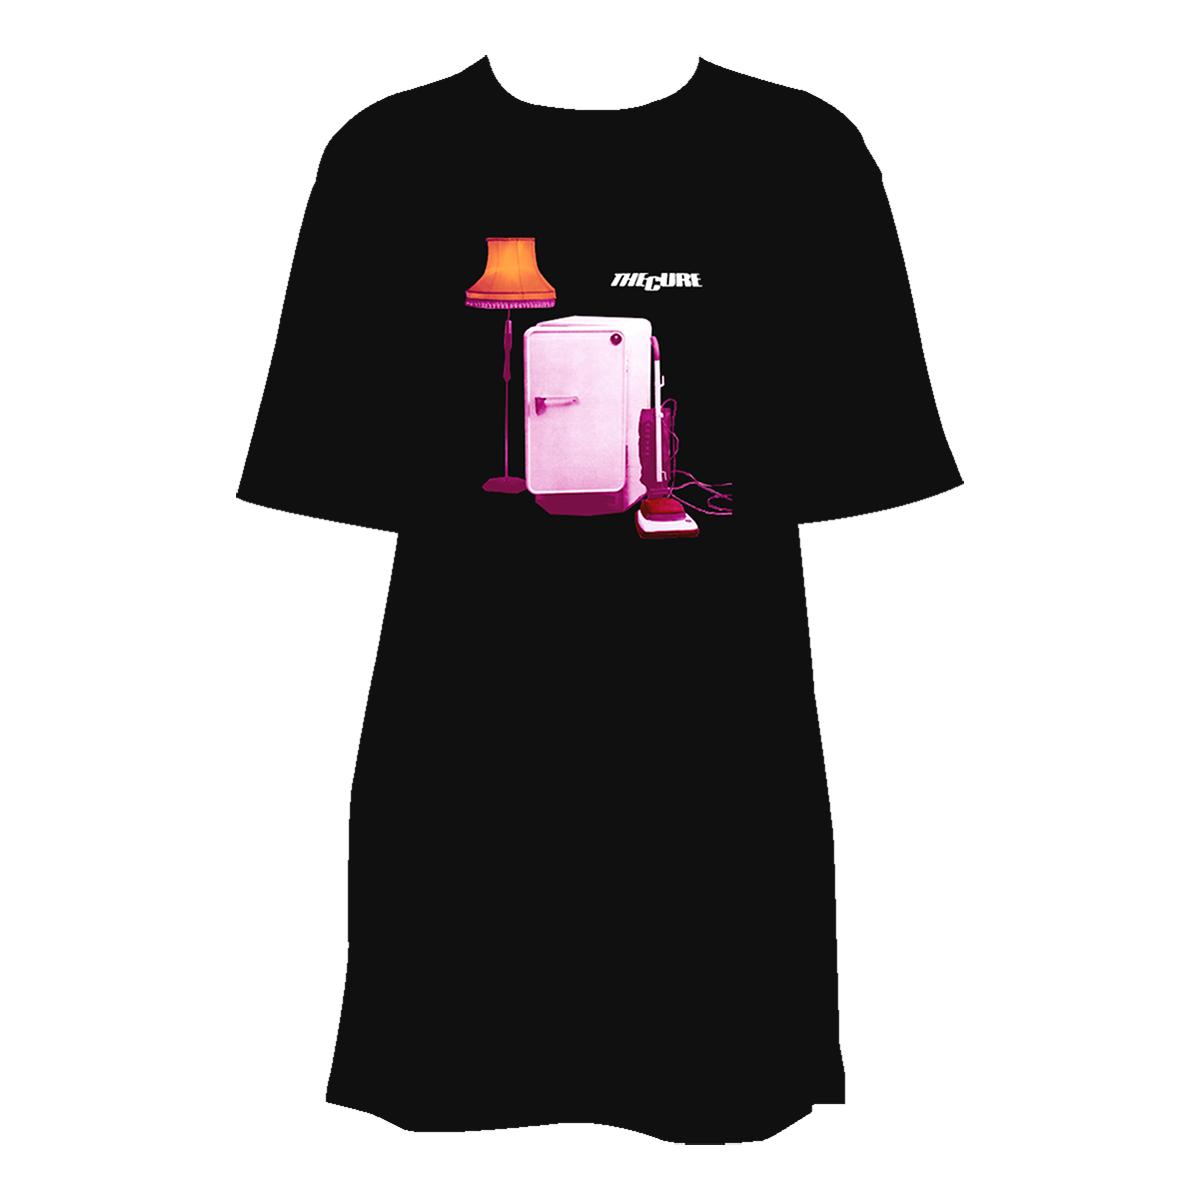 TIB Album Cover Black T-shirt Dress